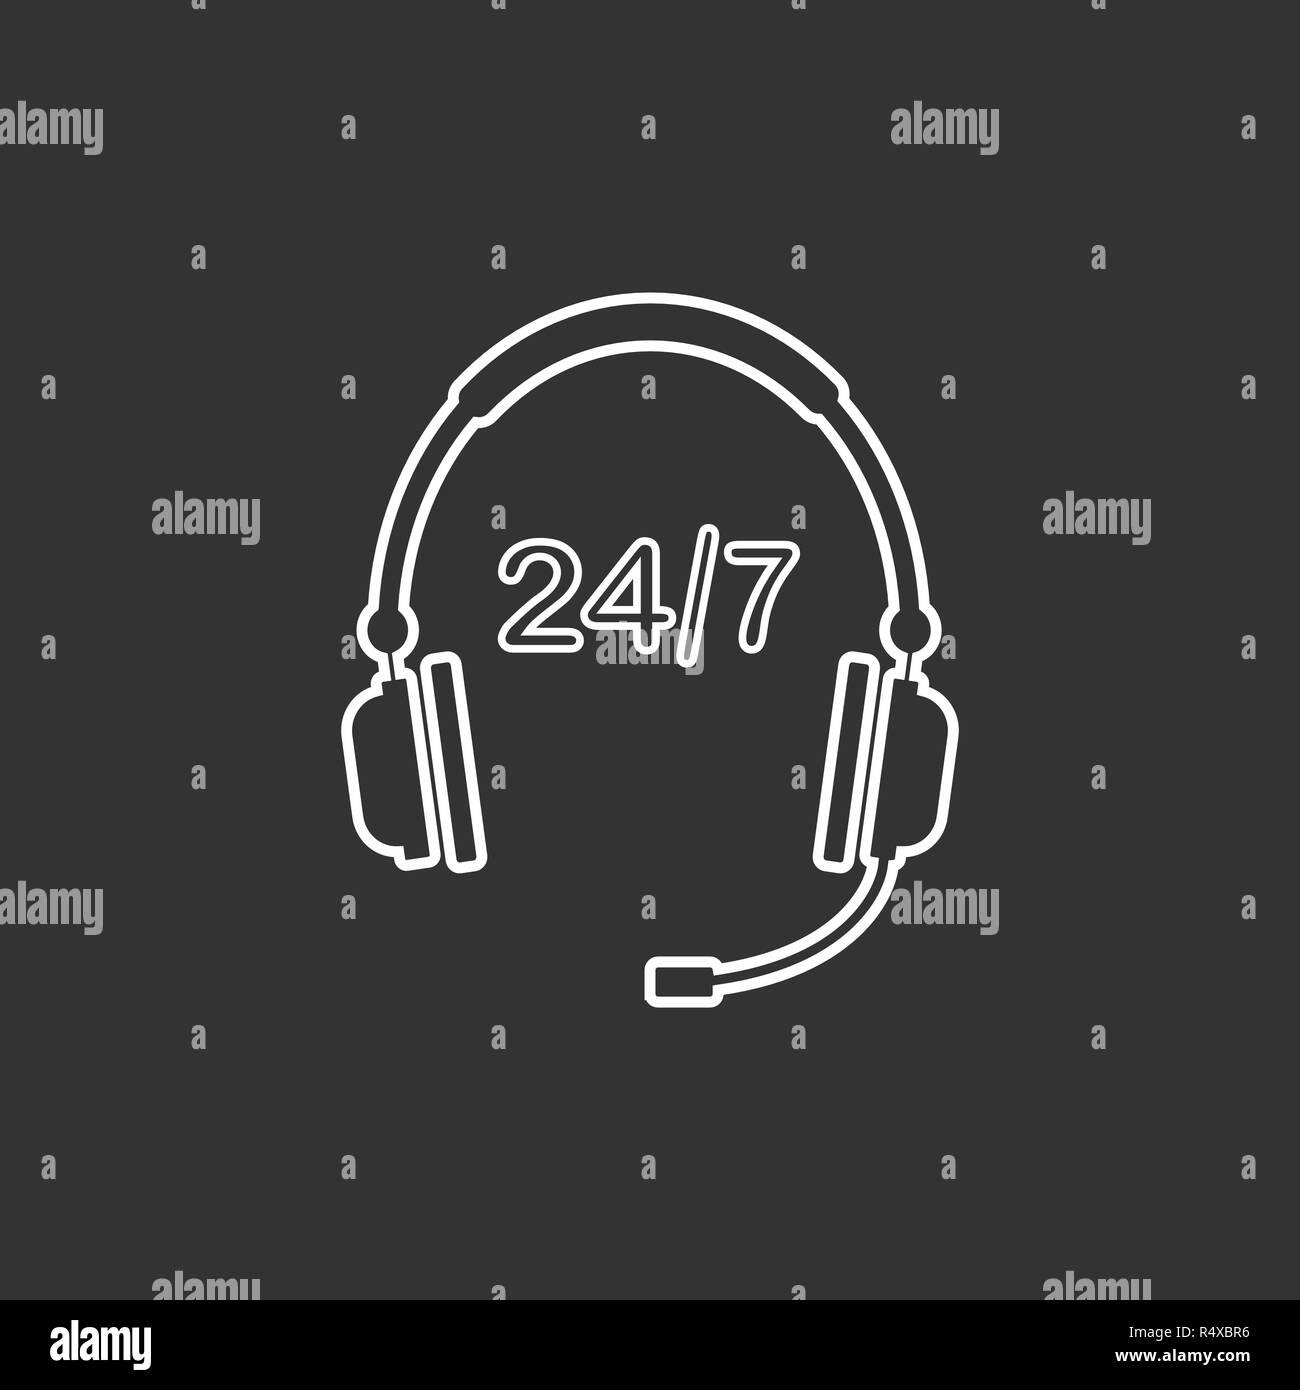 24 hour call center icon. Vector illustration, flat design. Stock Vector